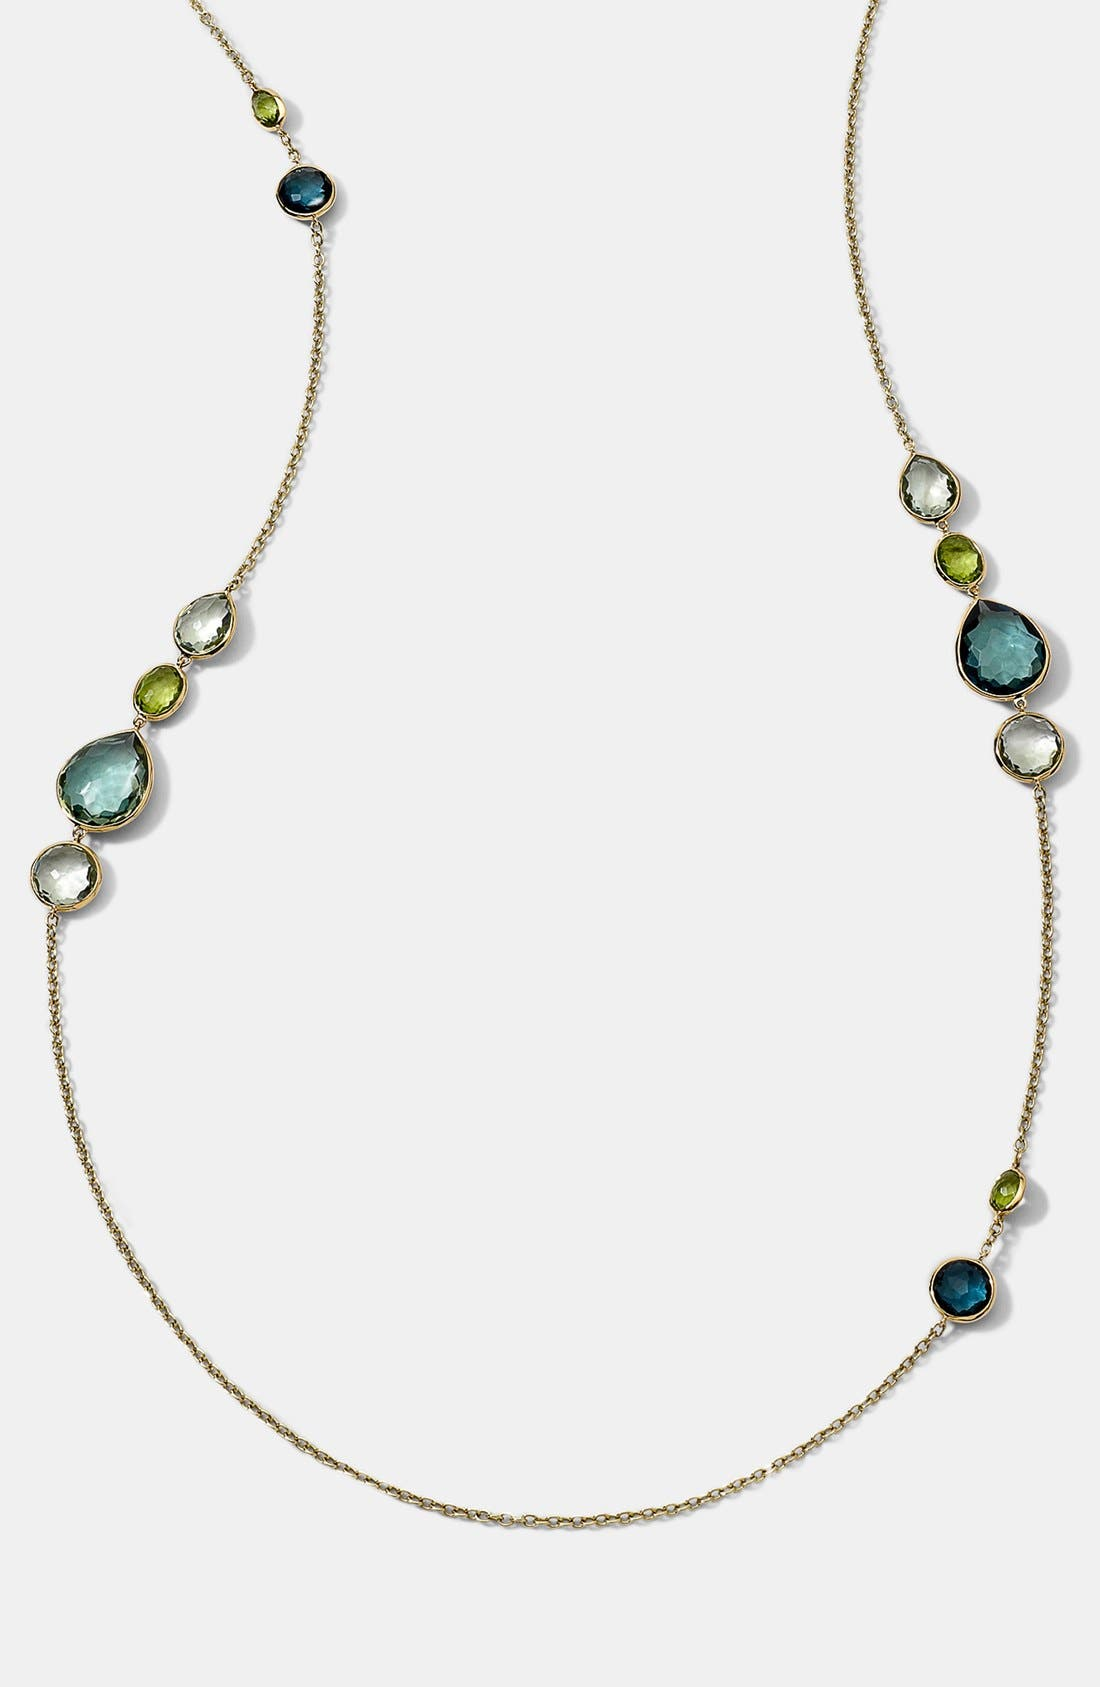 Alternate Image 1 Selected - Ippolita 'Rock Candy - Gelato' 18k Gold Long Station Necklace